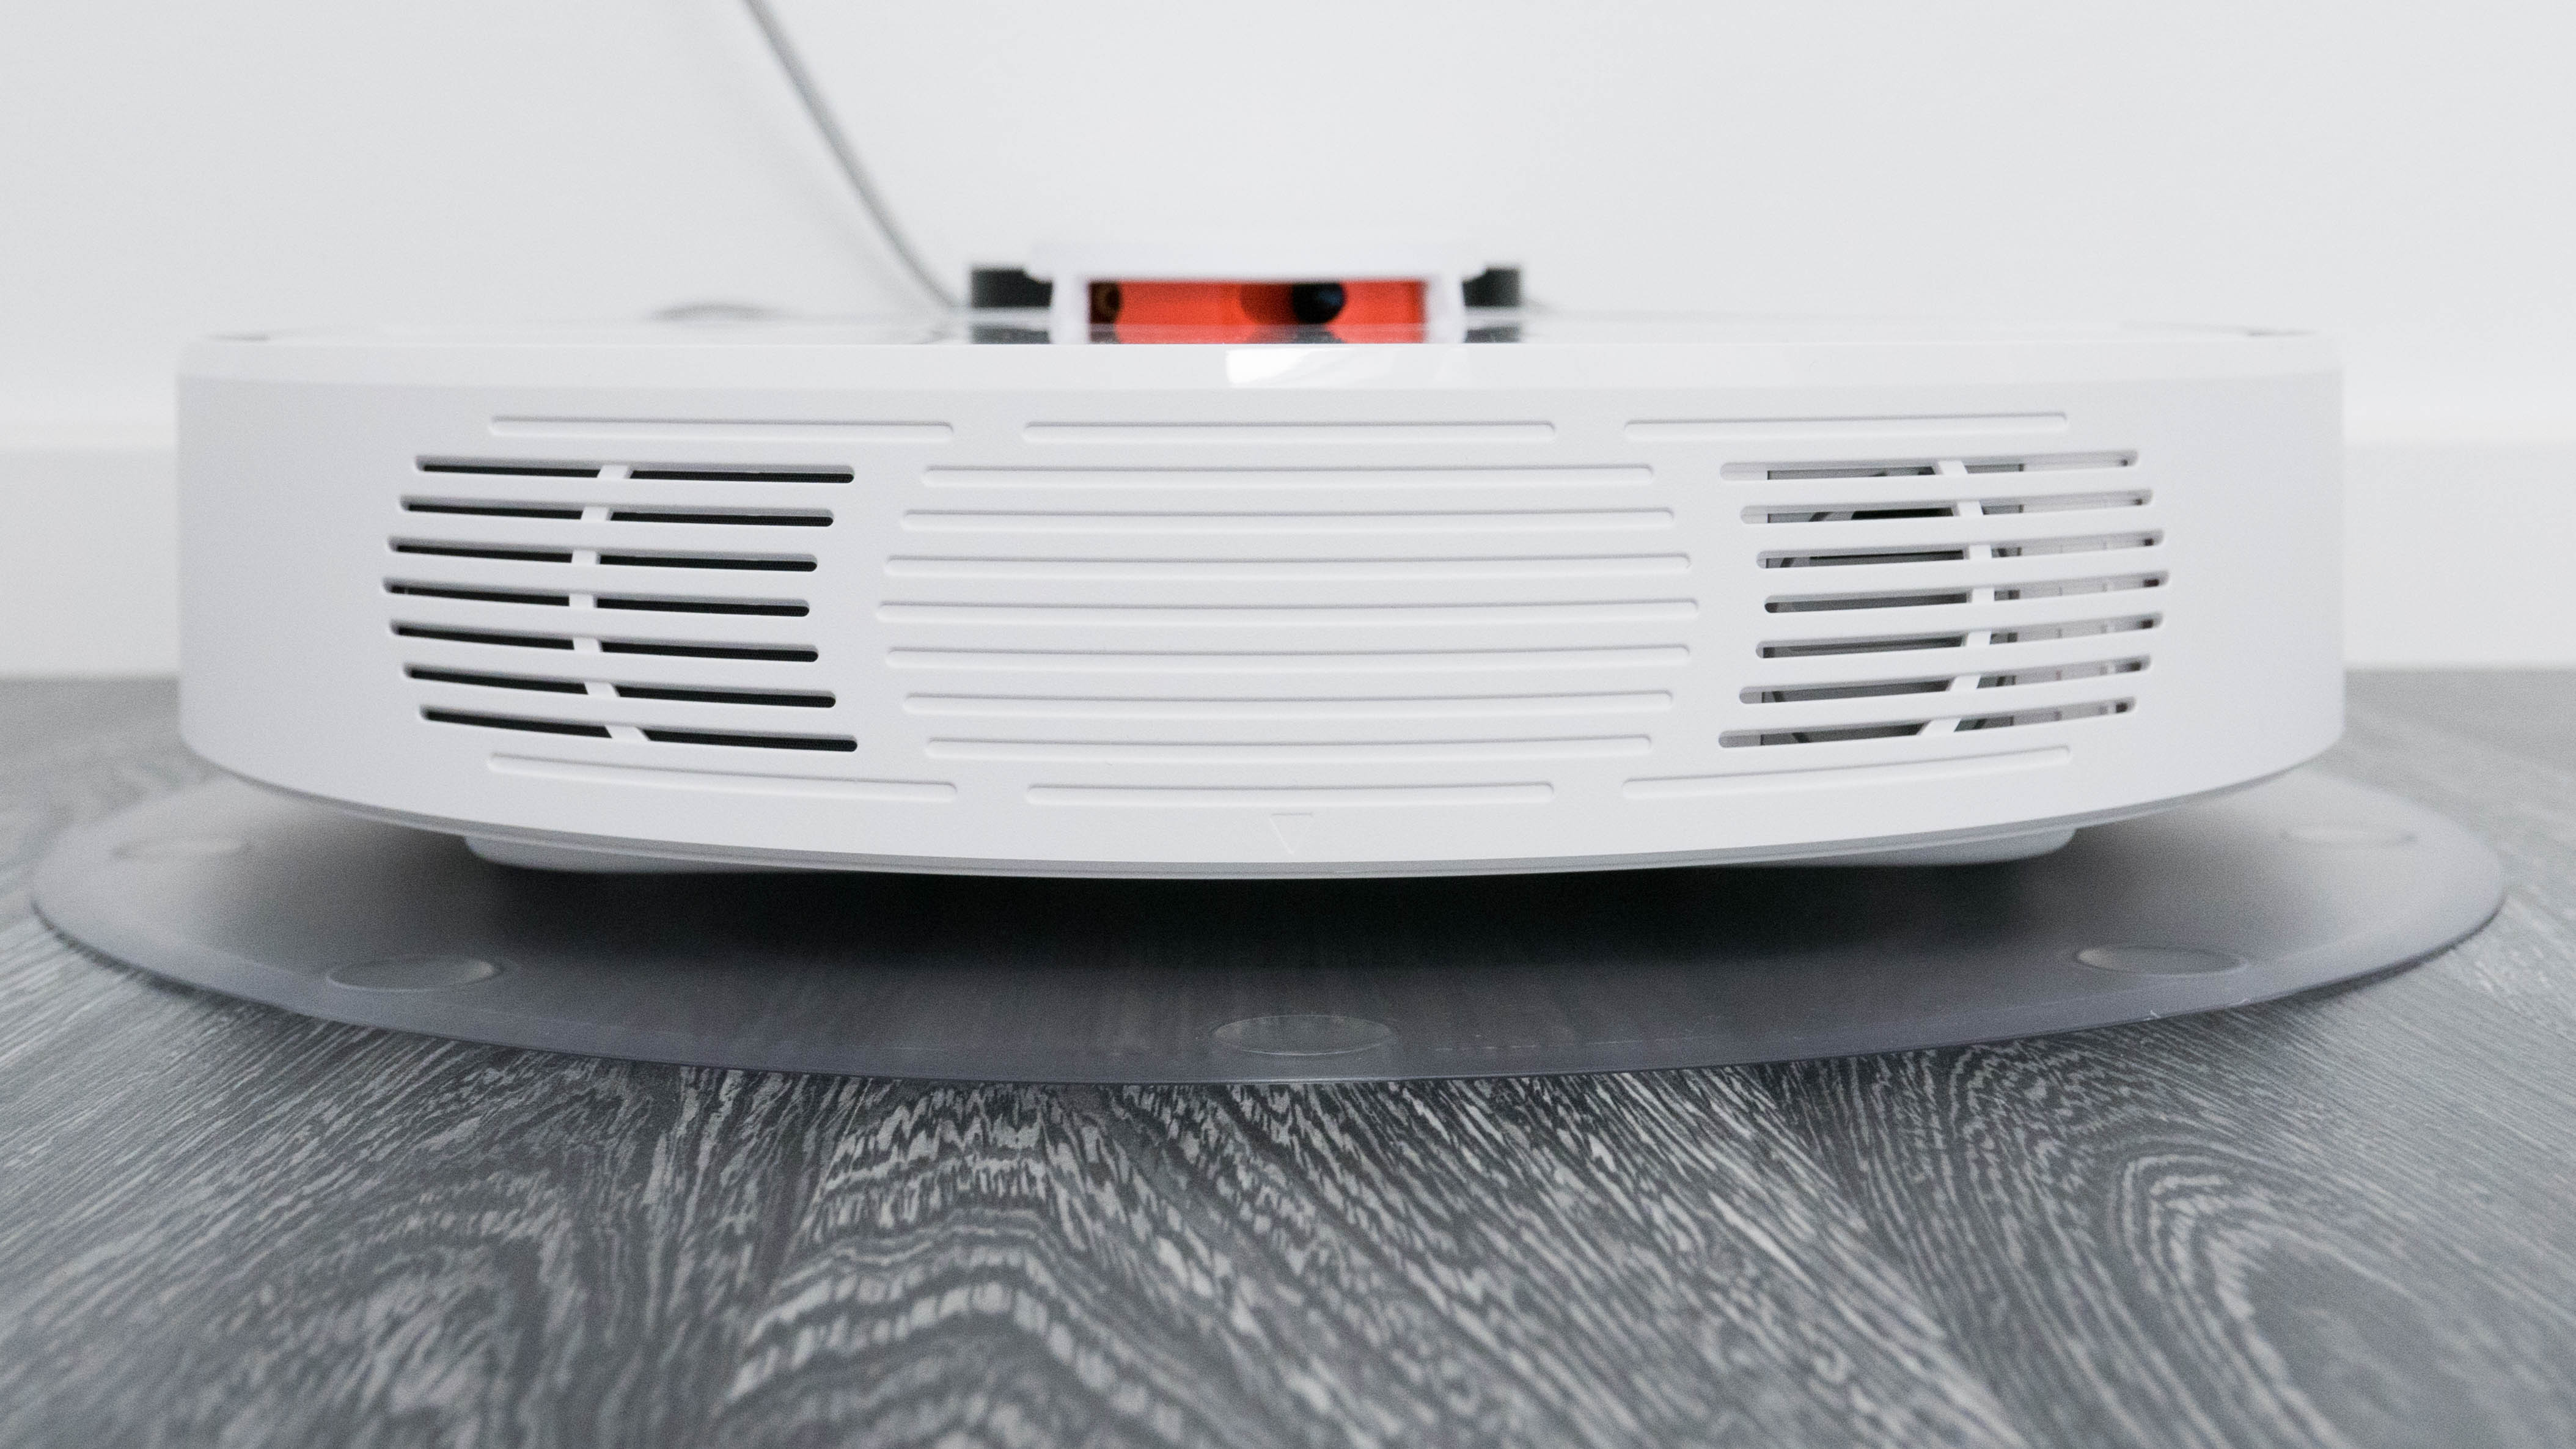 Xiaomi Mi Robot 2 Roborock S50 Roboter Details 5